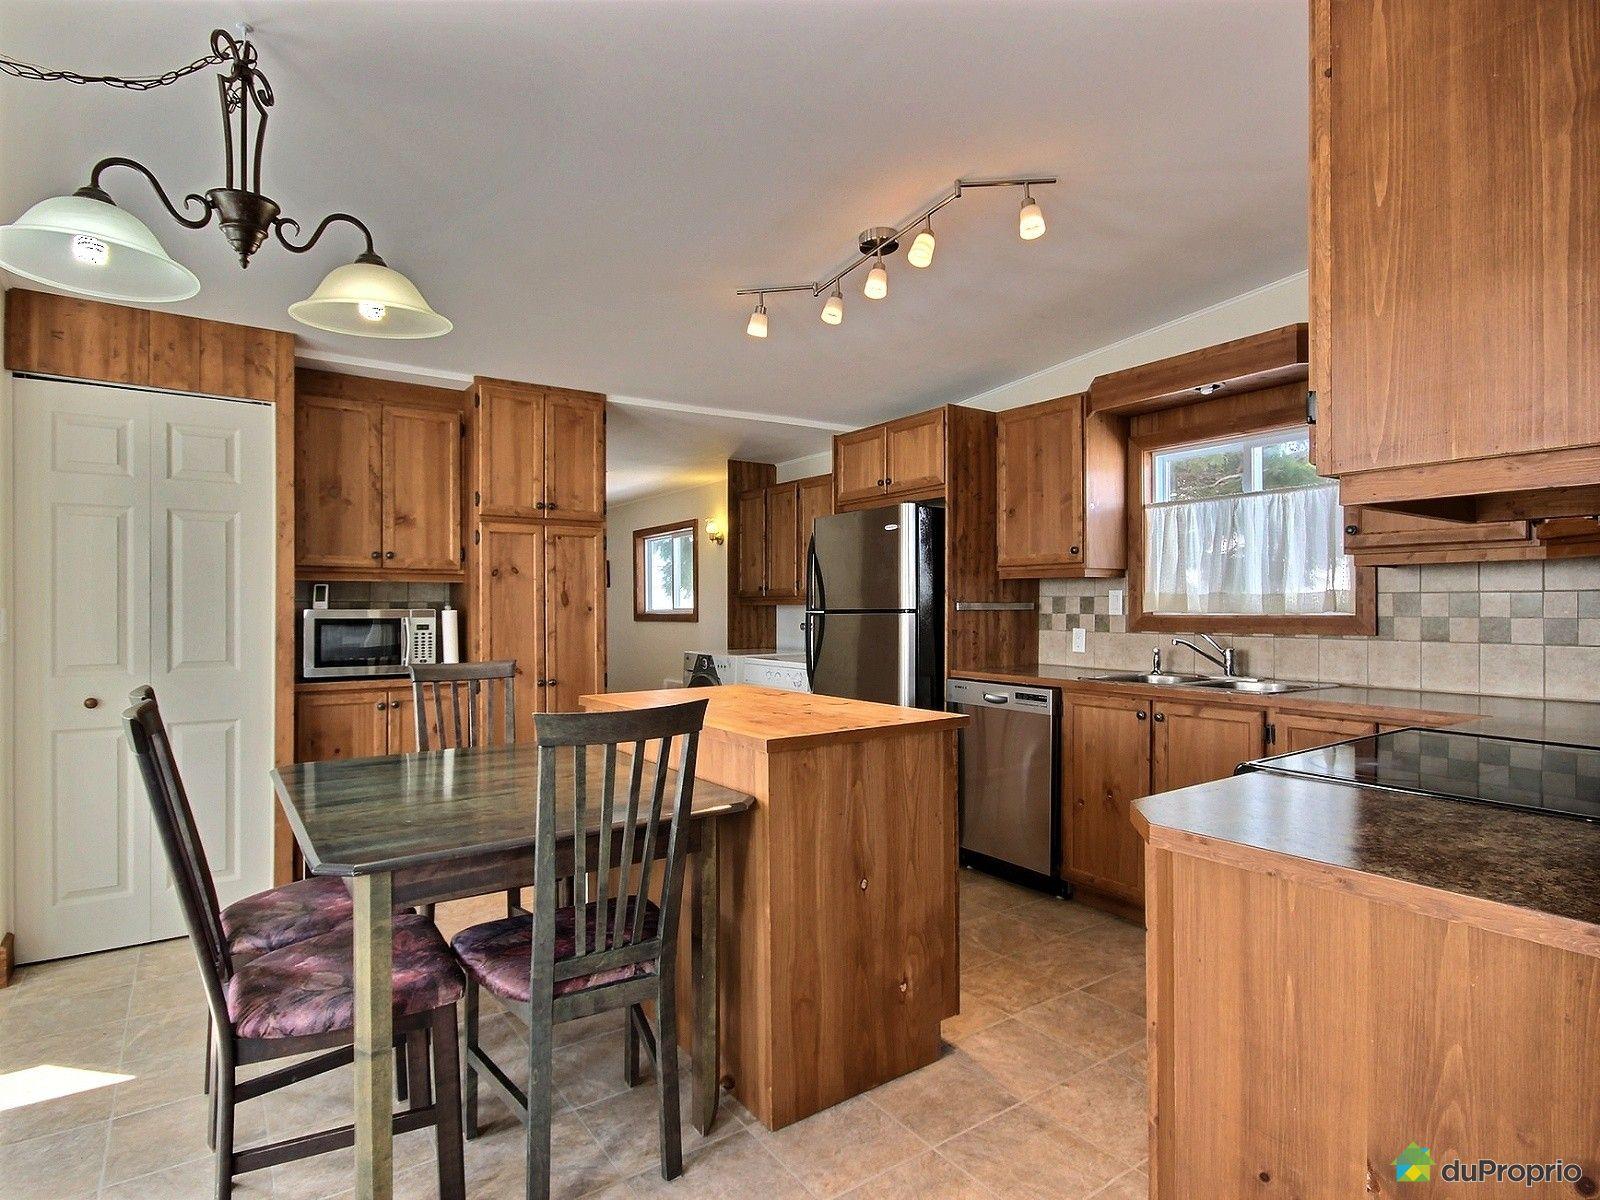 maison vendu ste foy immobilier qu bec duproprio 692636. Black Bedroom Furniture Sets. Home Design Ideas